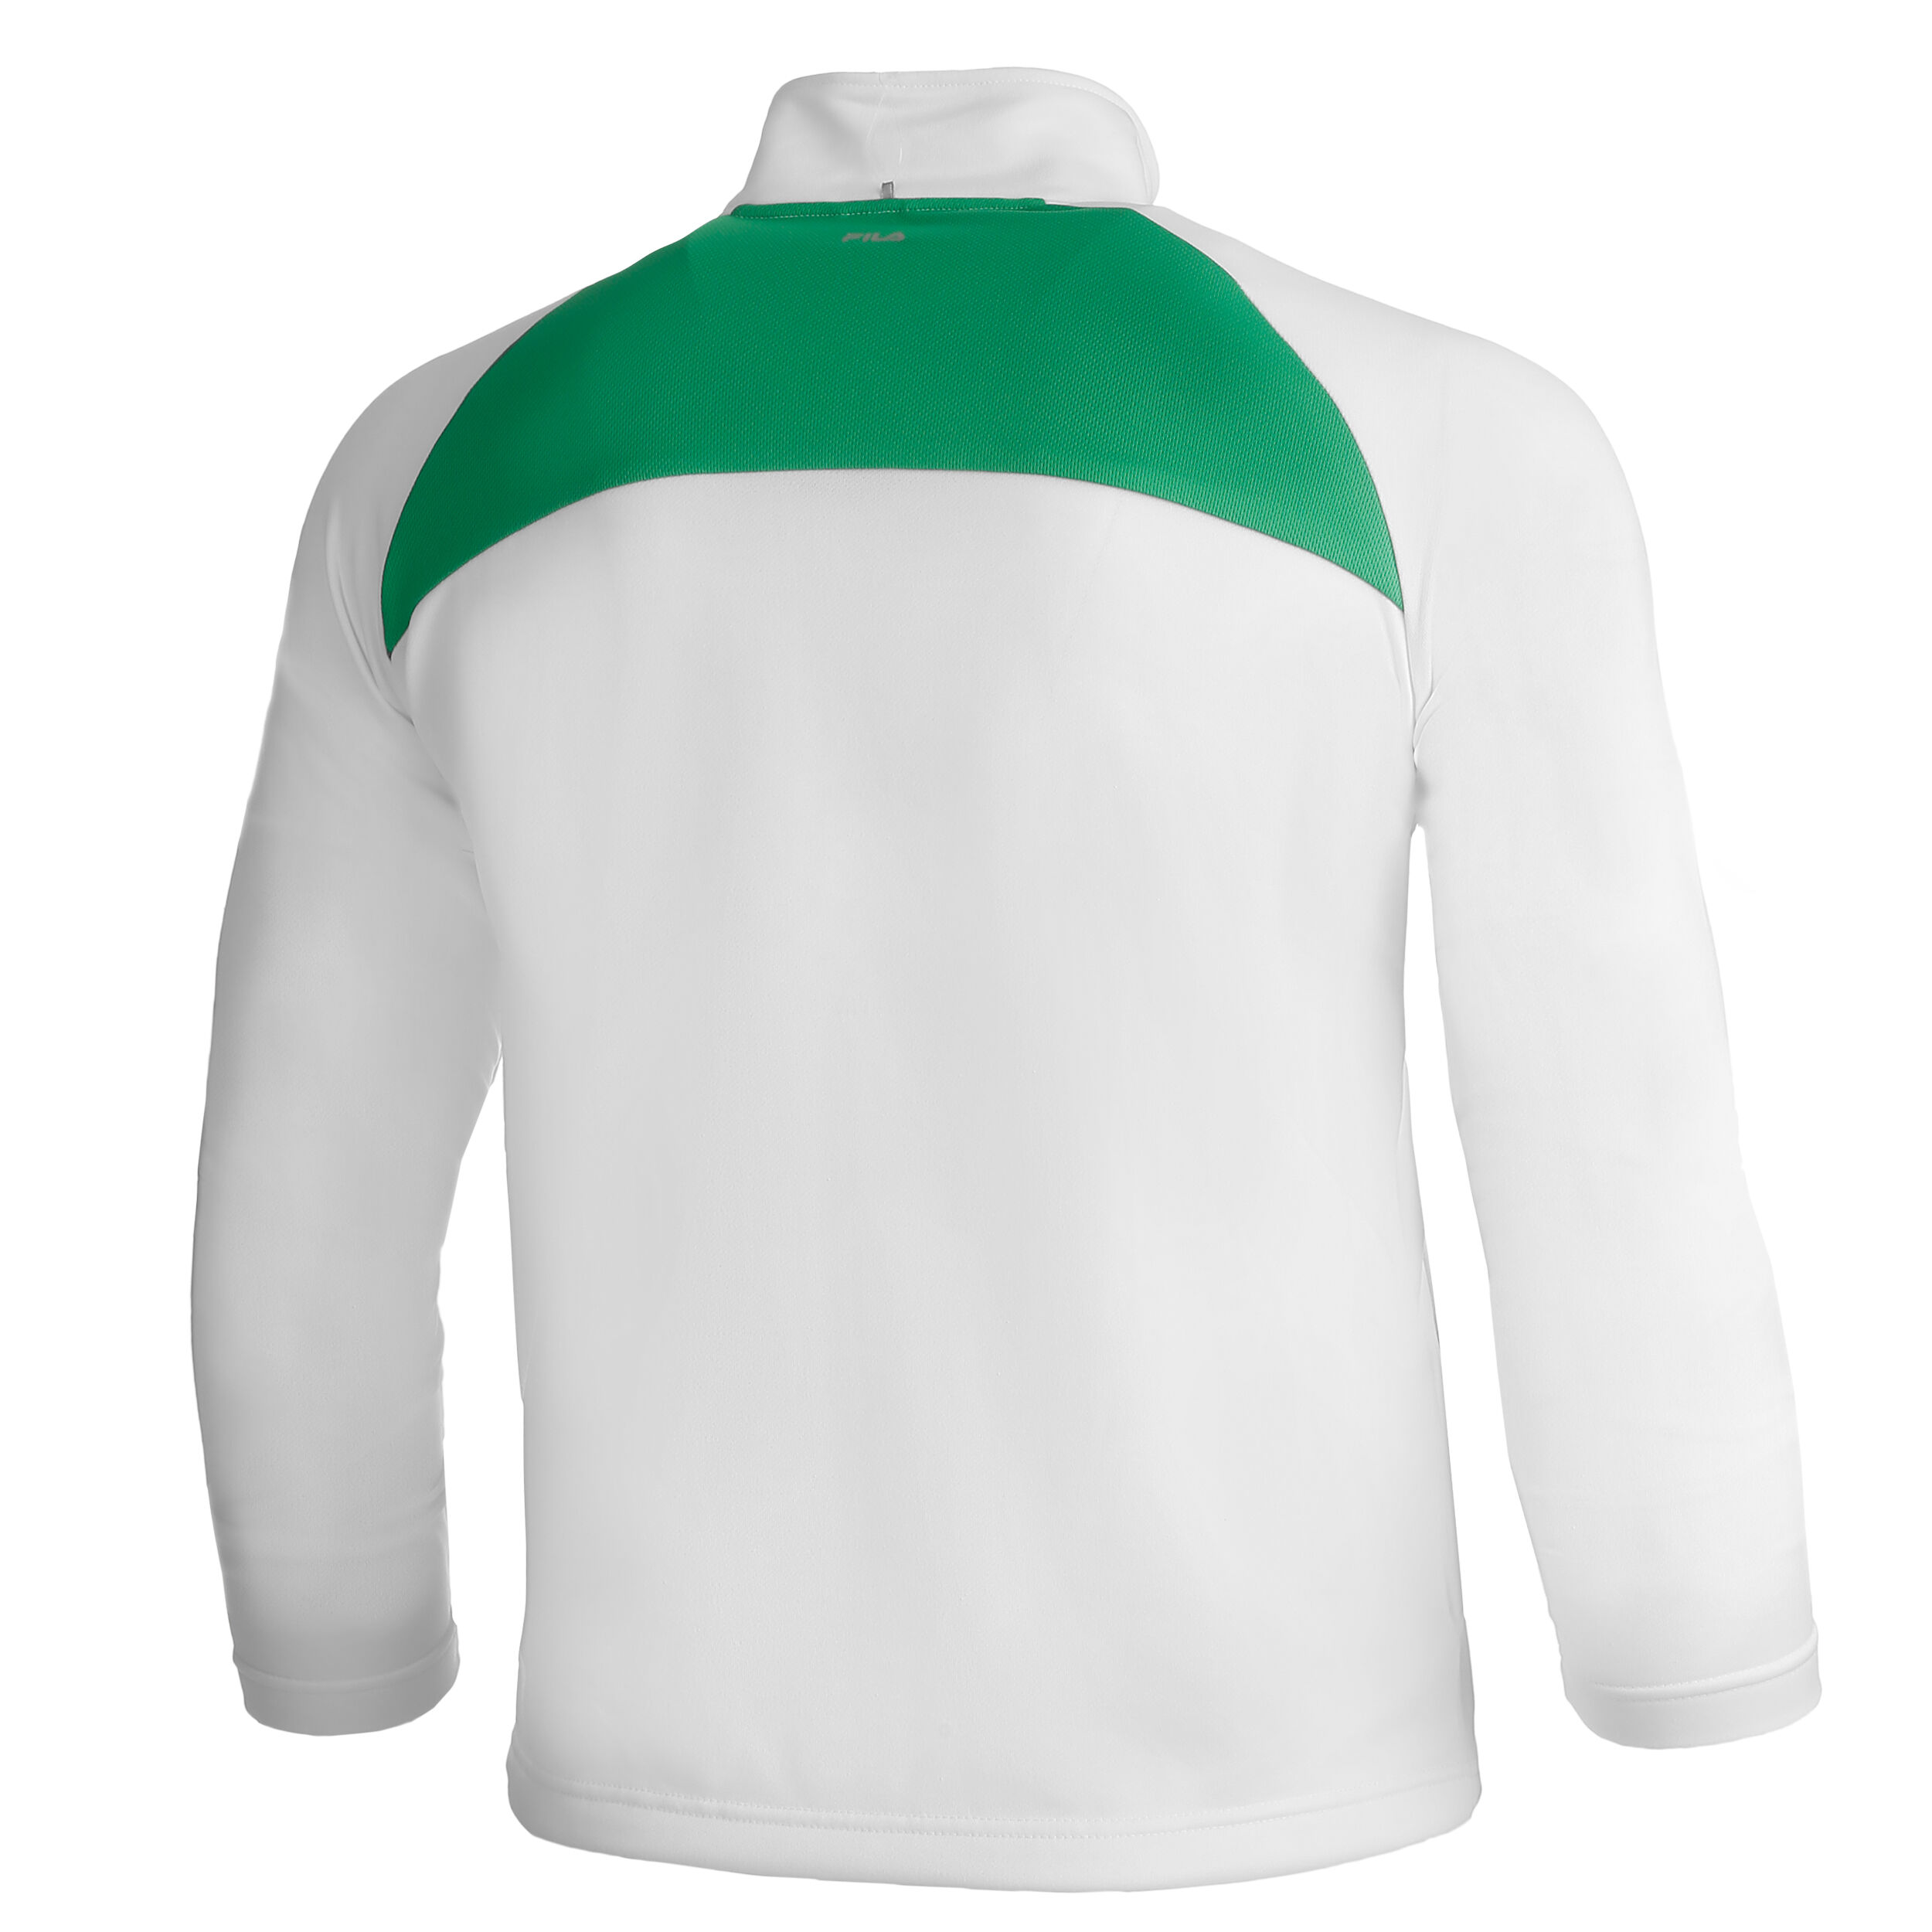 Fila Jakob Trainingsjacke Herren Weiß, Grün online kaufen